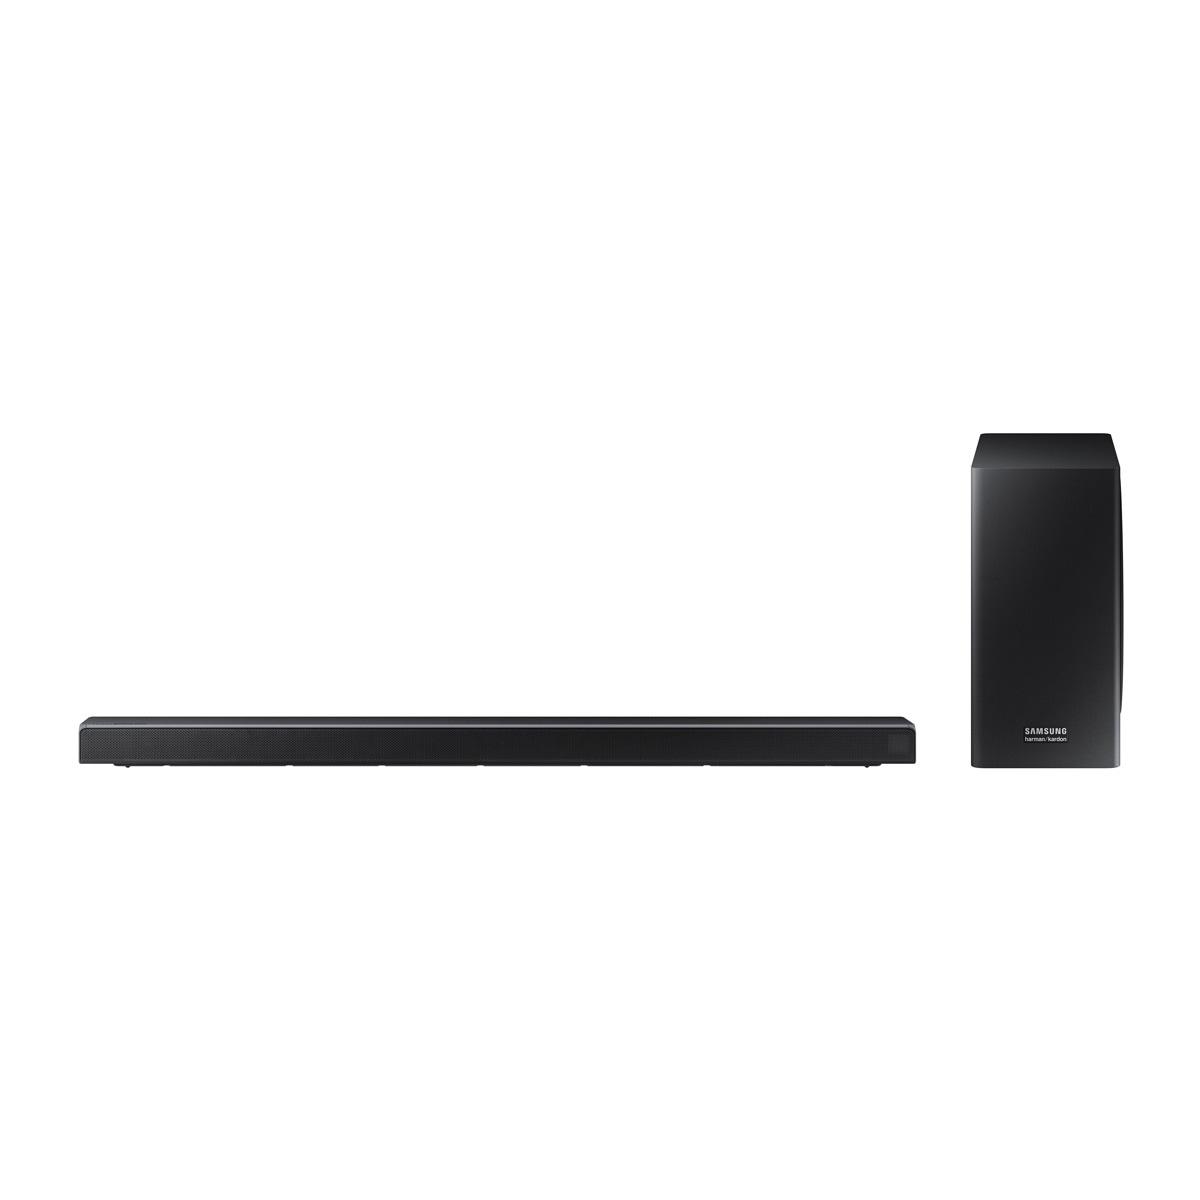 Barra de sonido Samsung Harman Kardon HW-Q70R